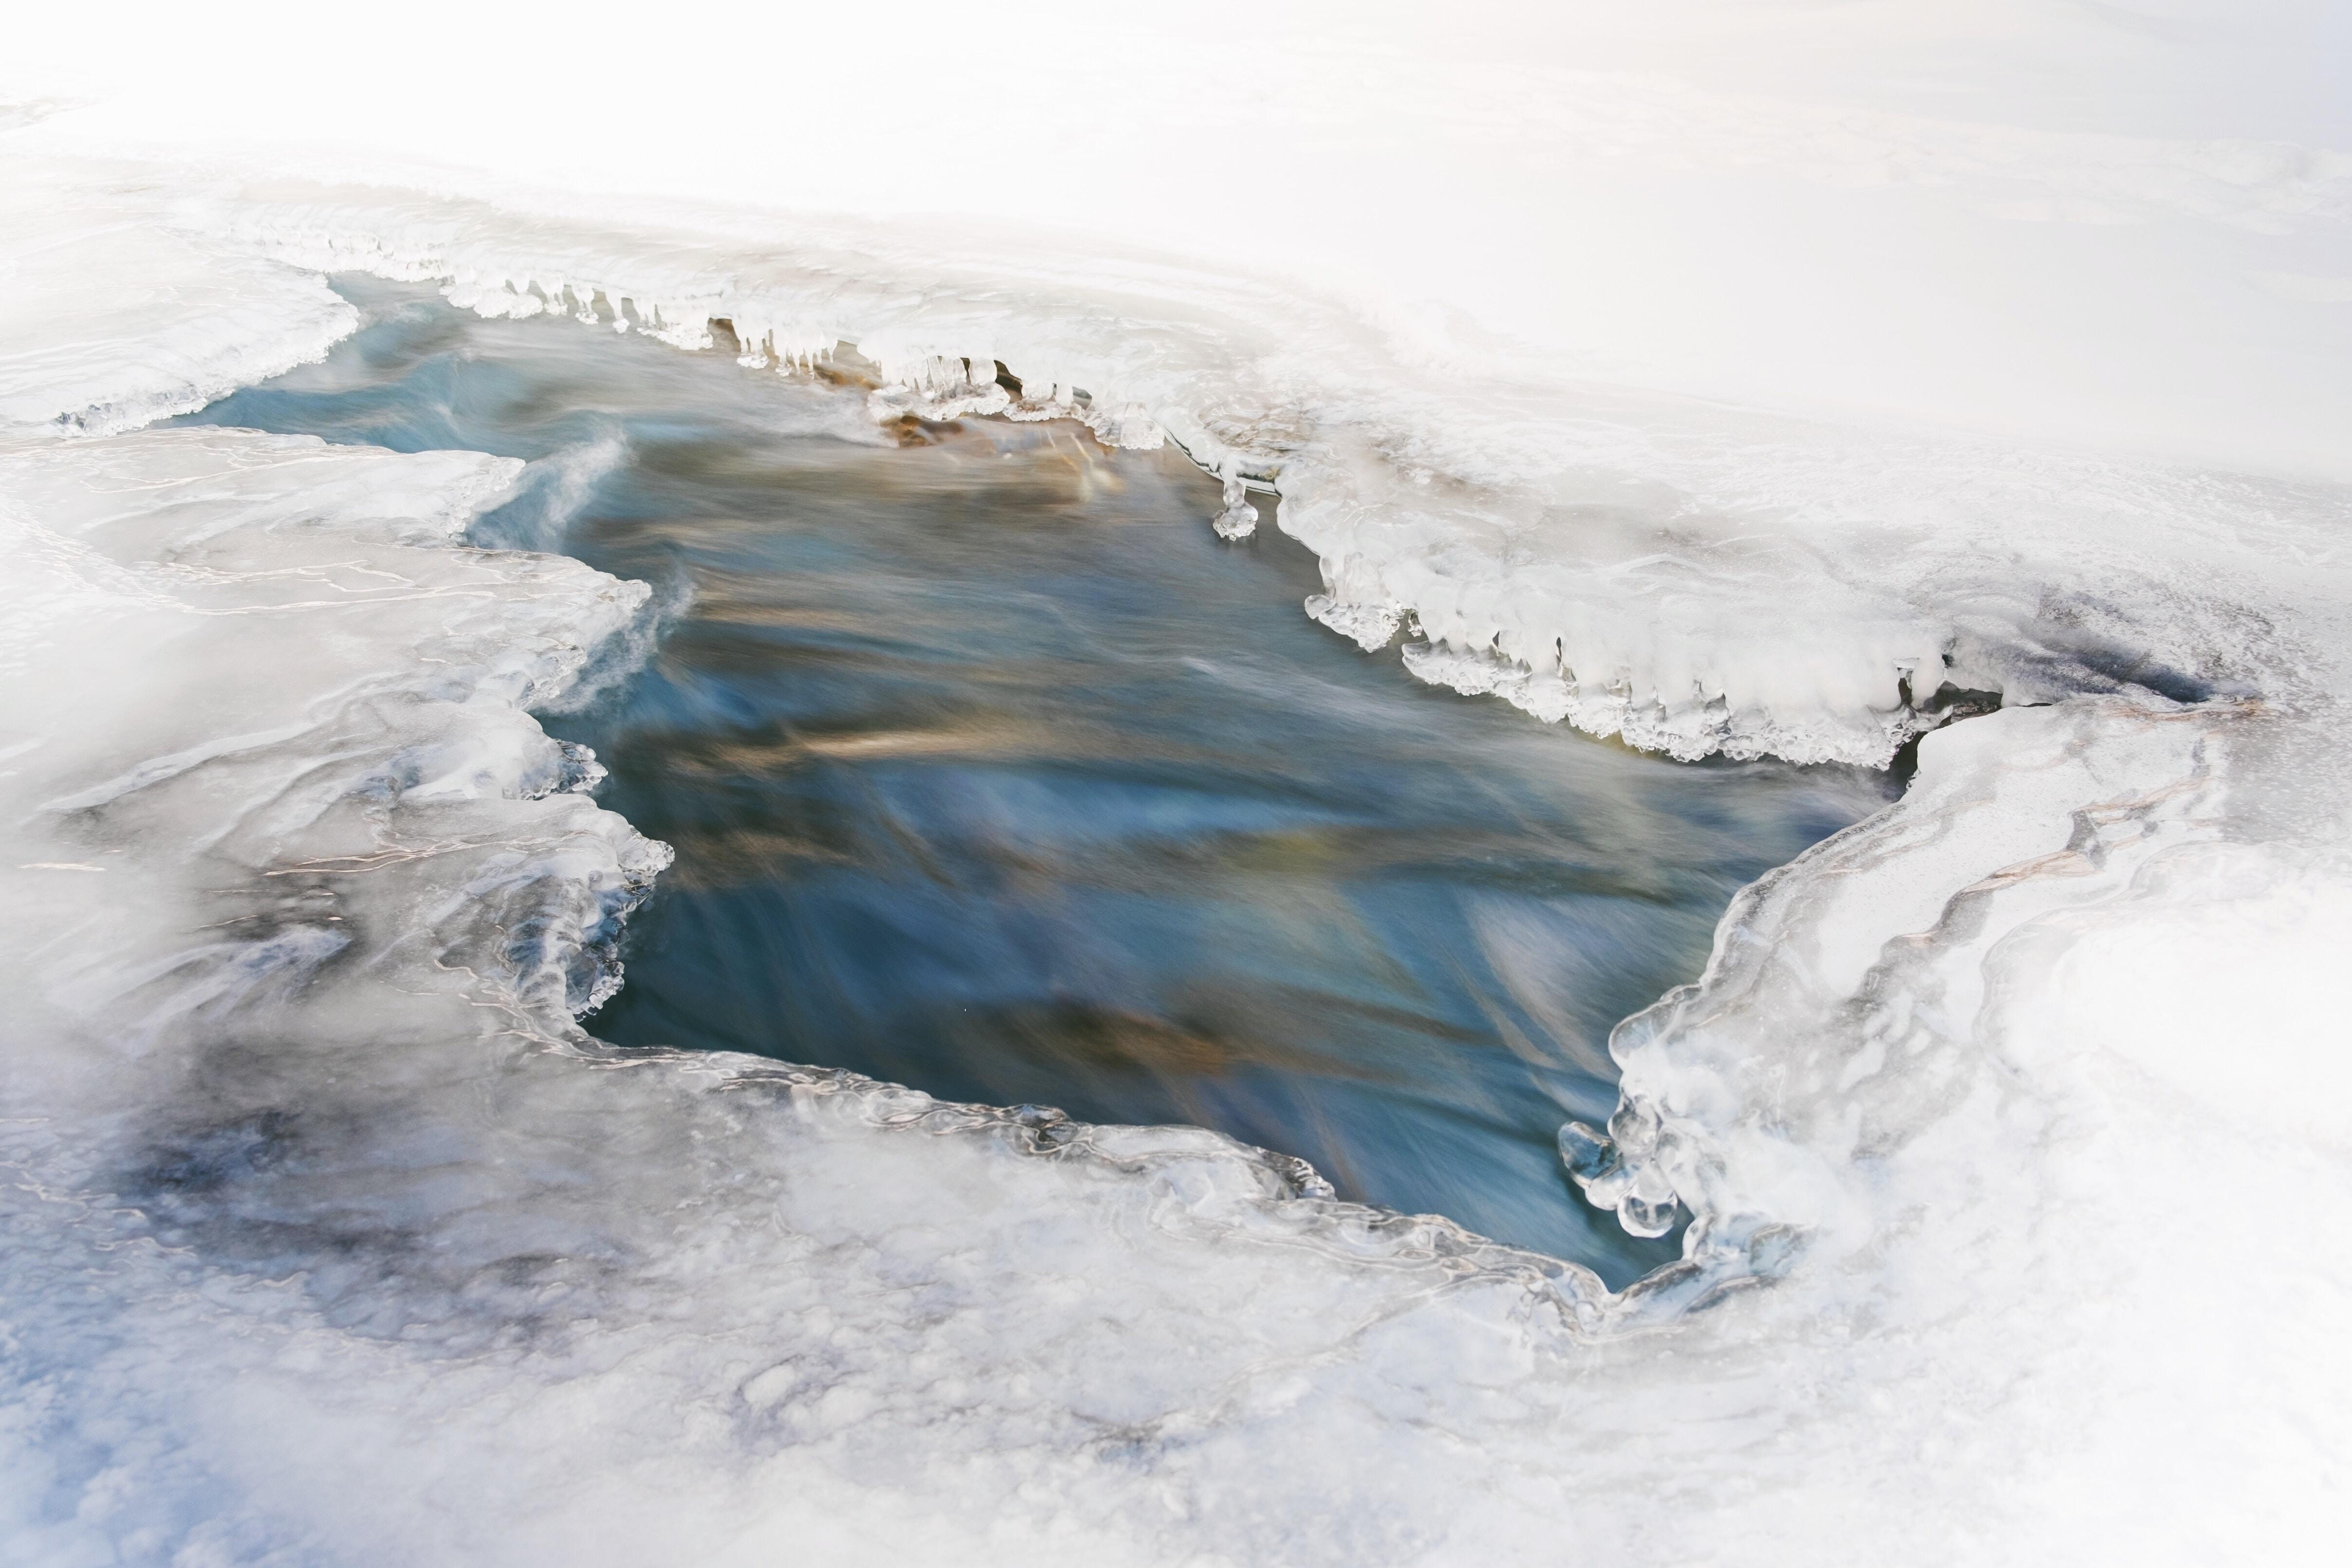 aerial photo of iceberg during daytime